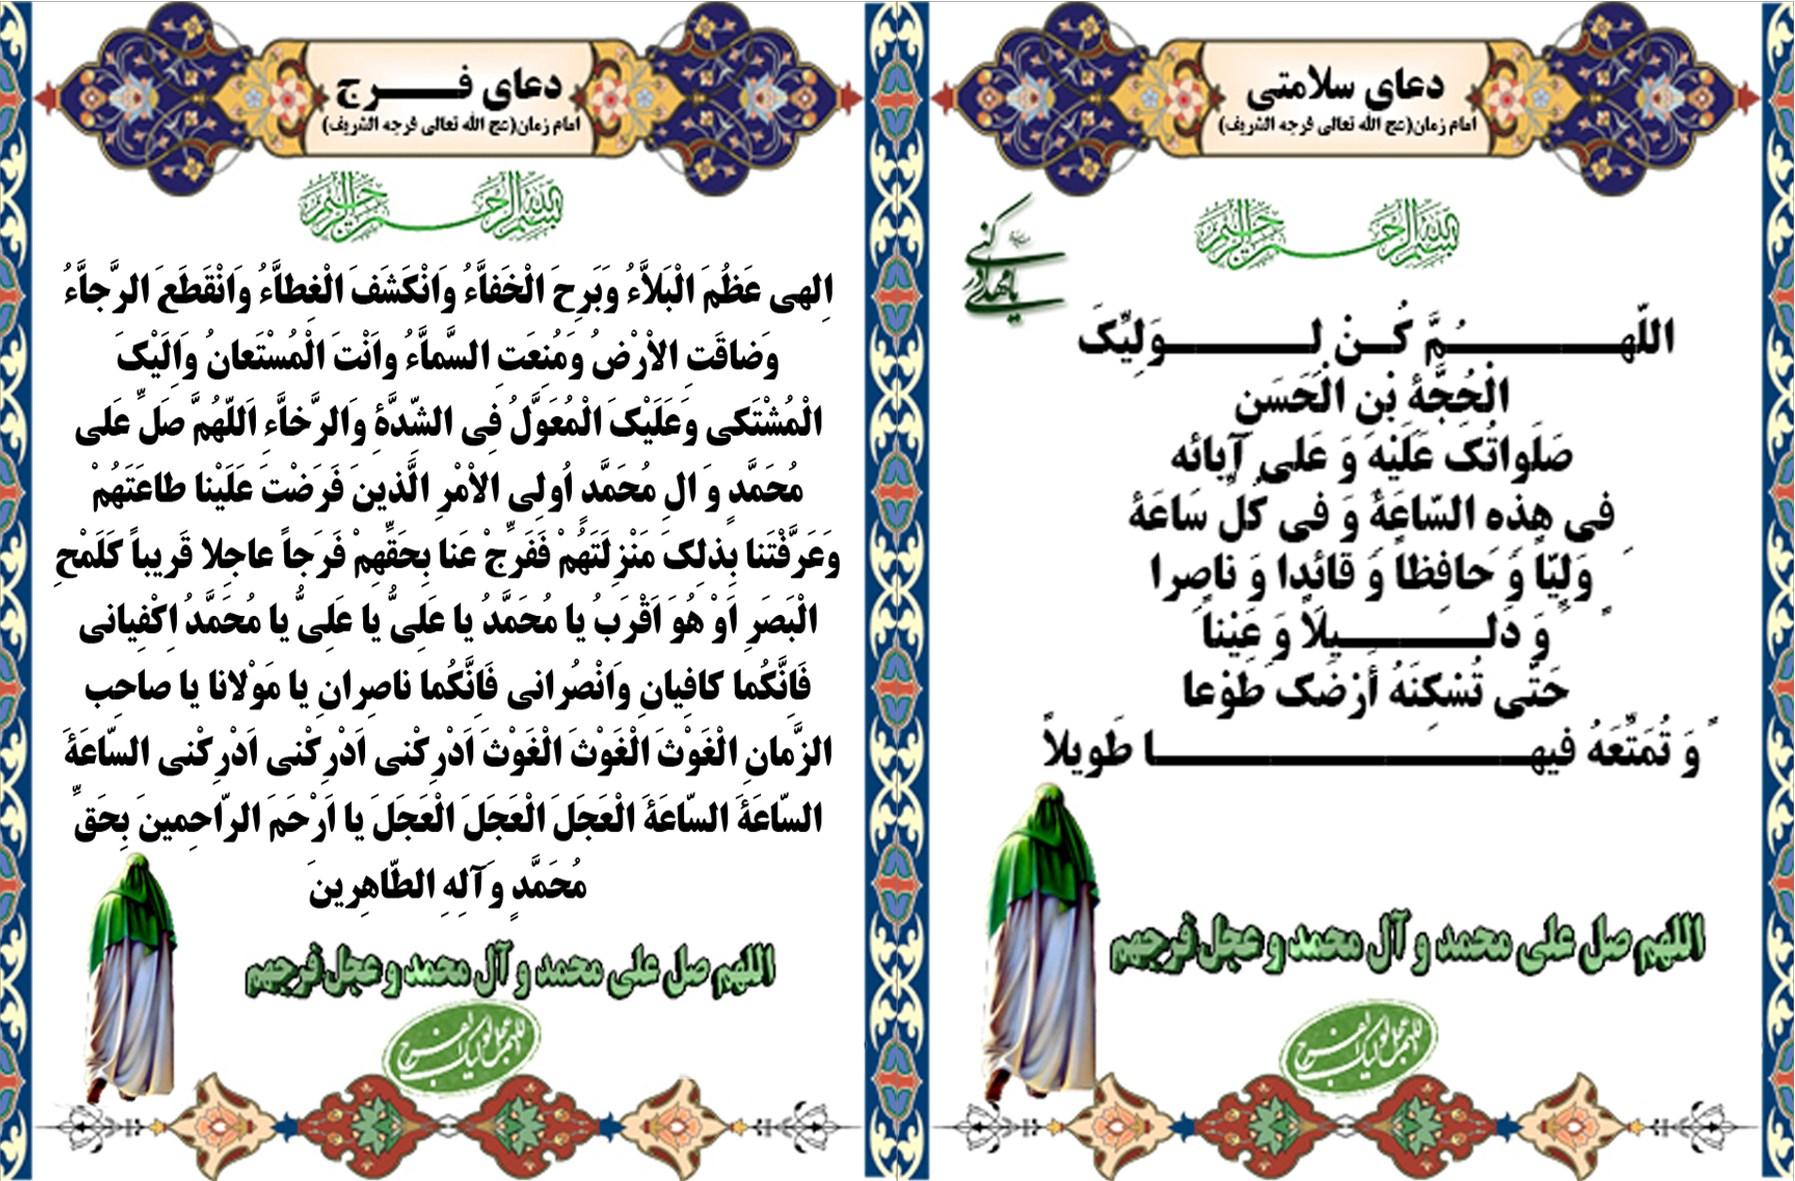 http://bayanbox.ir/view/5364183791861837071/doaye-faraj-va-salamati.jpg